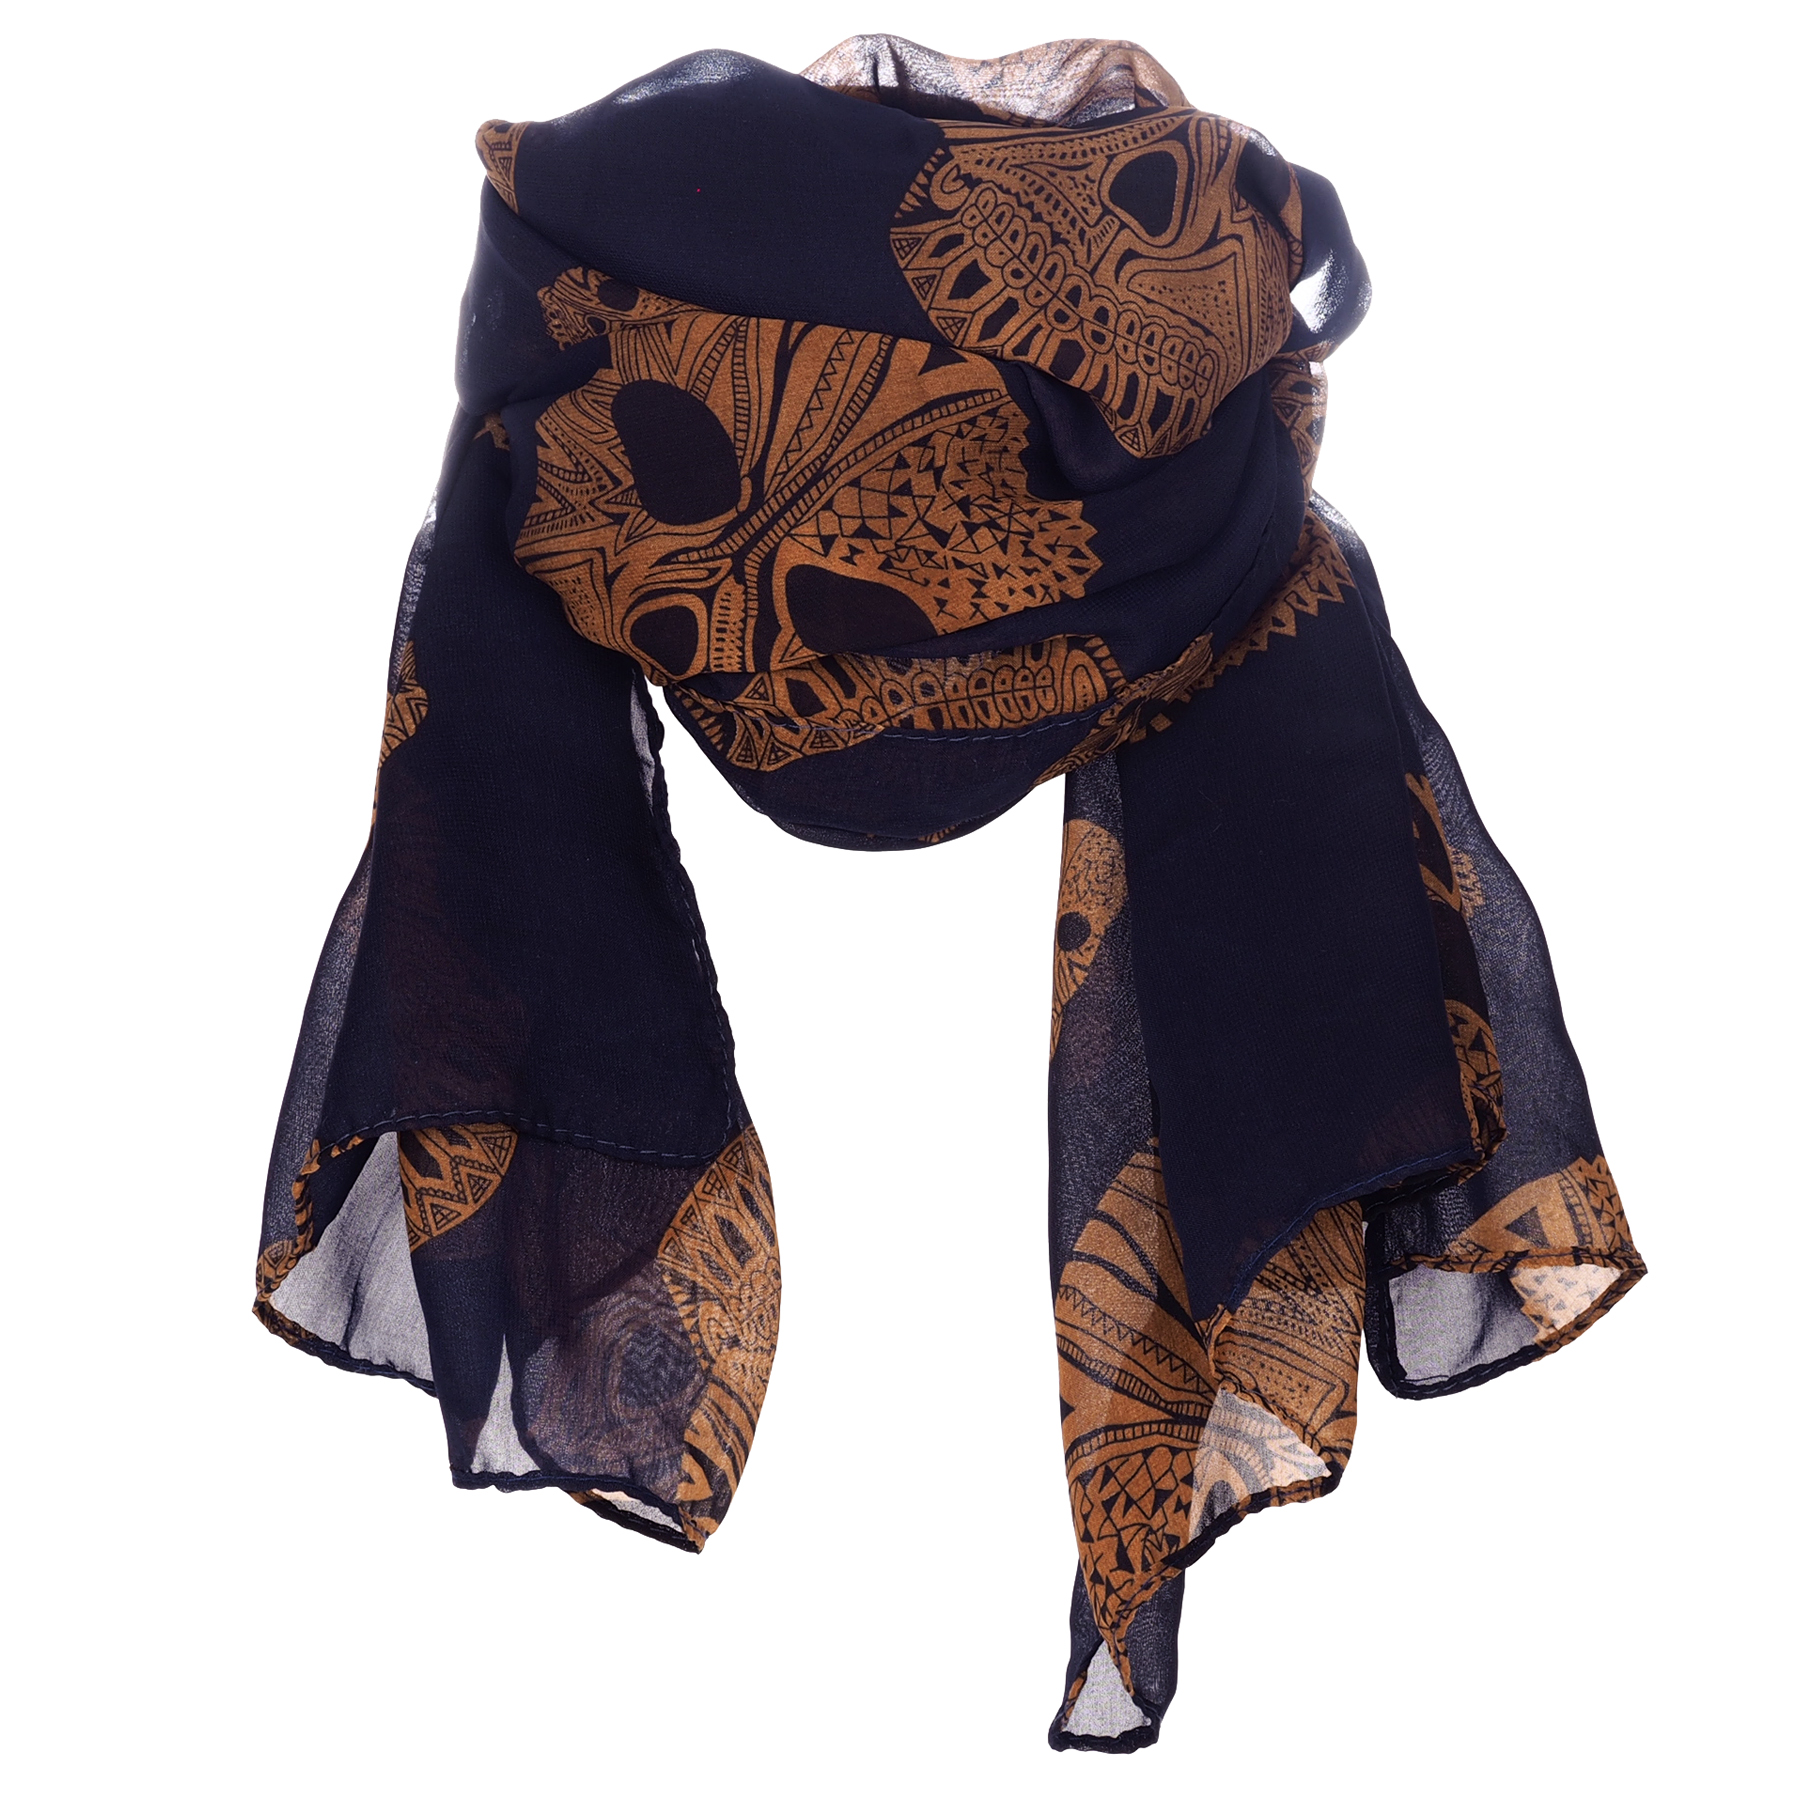 Foulard femme bleu marine et camel tête de mort e367082639b